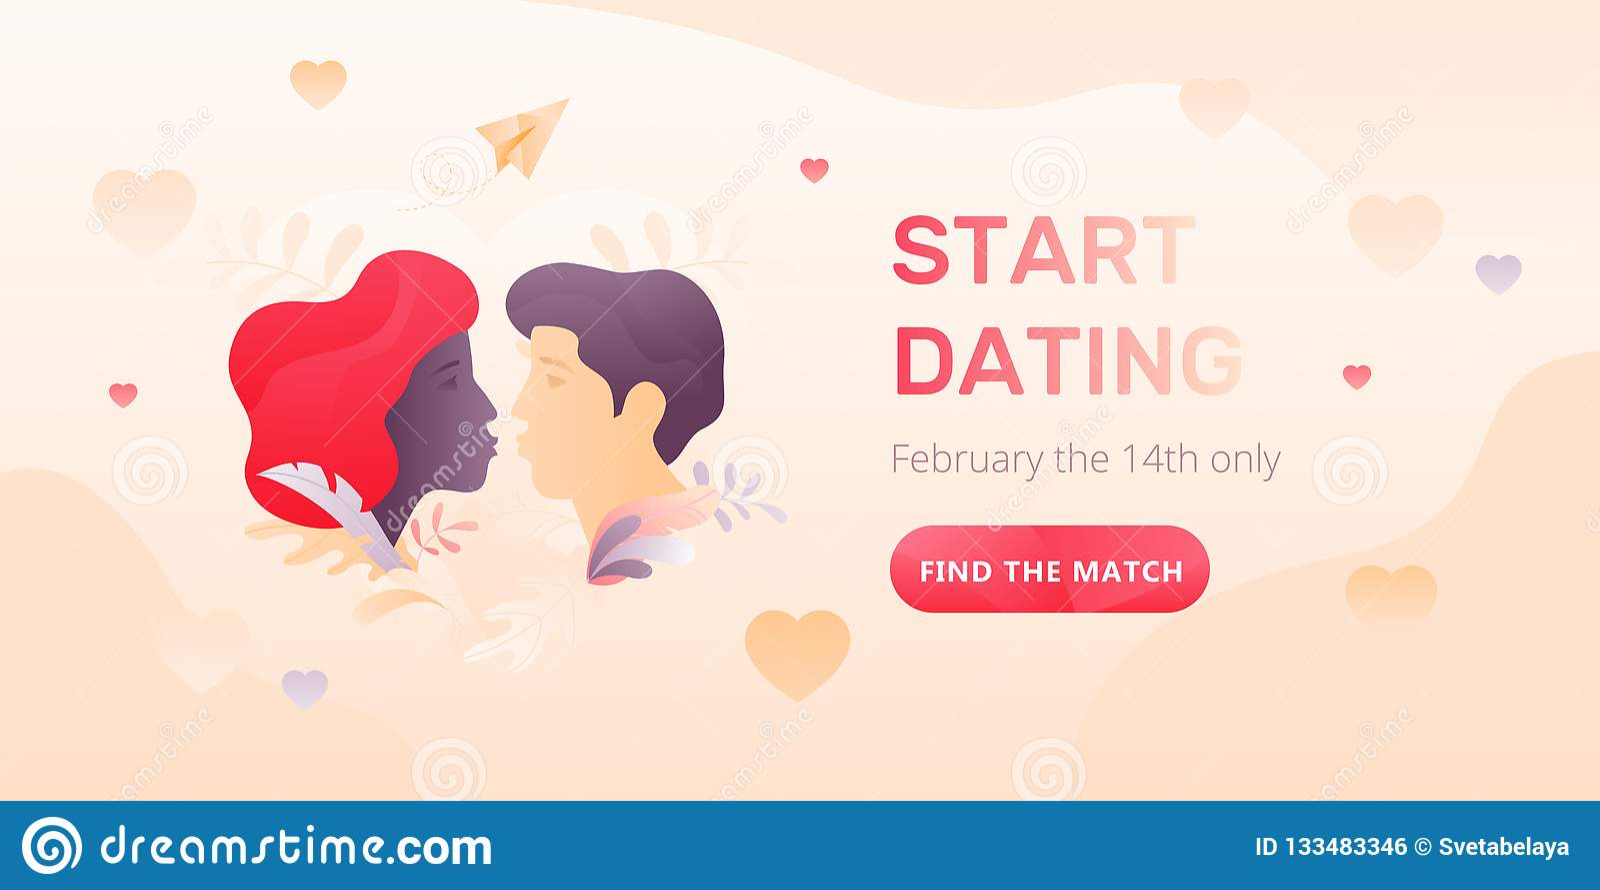 Online matchmaking business plan